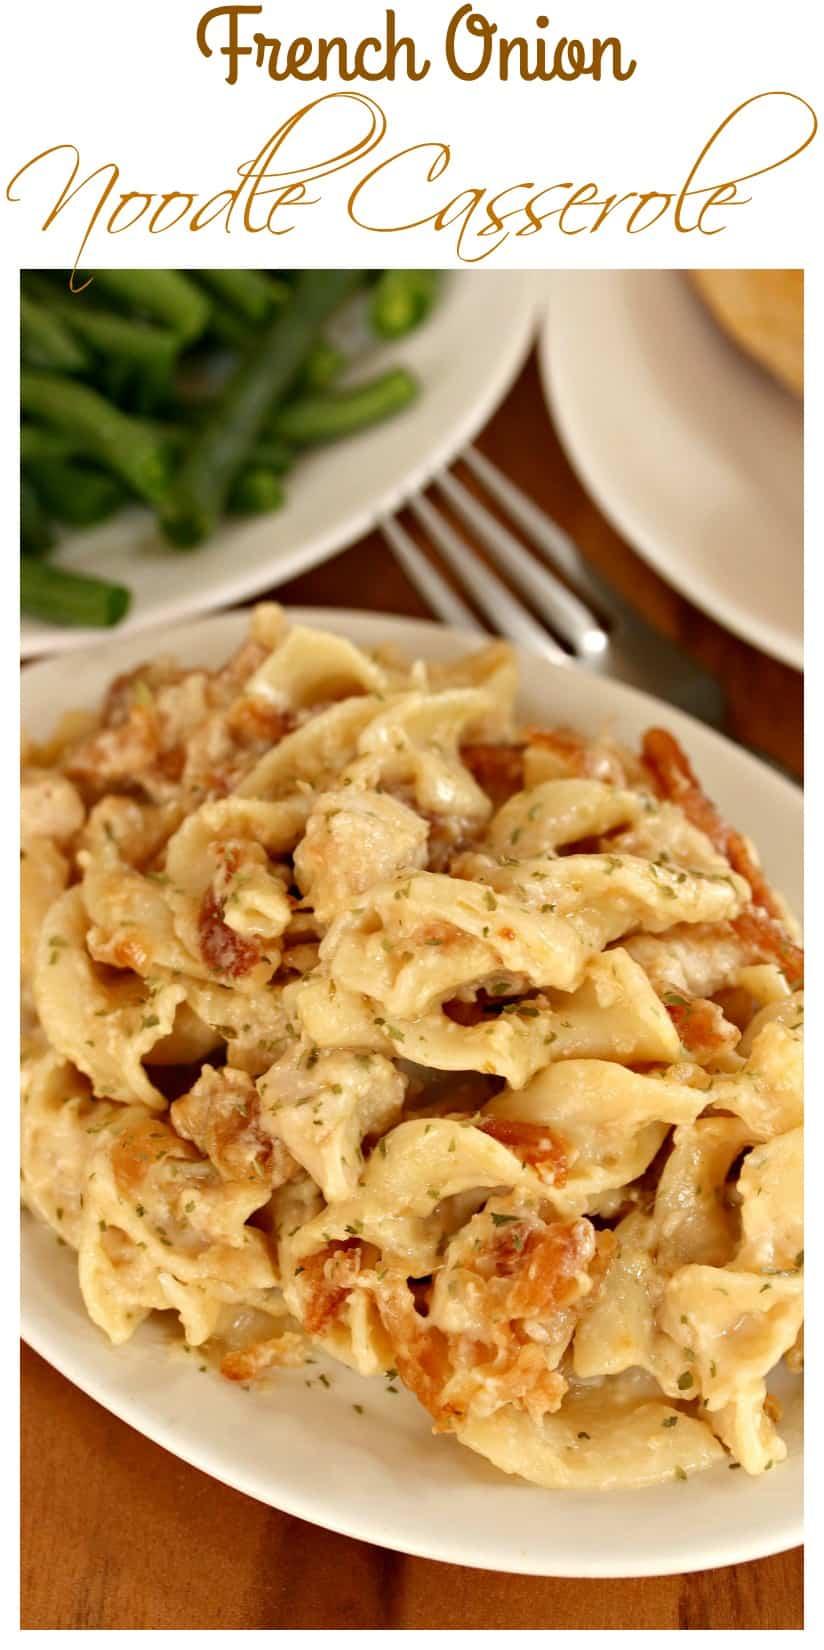 French-Onion-Noodle-Casserole